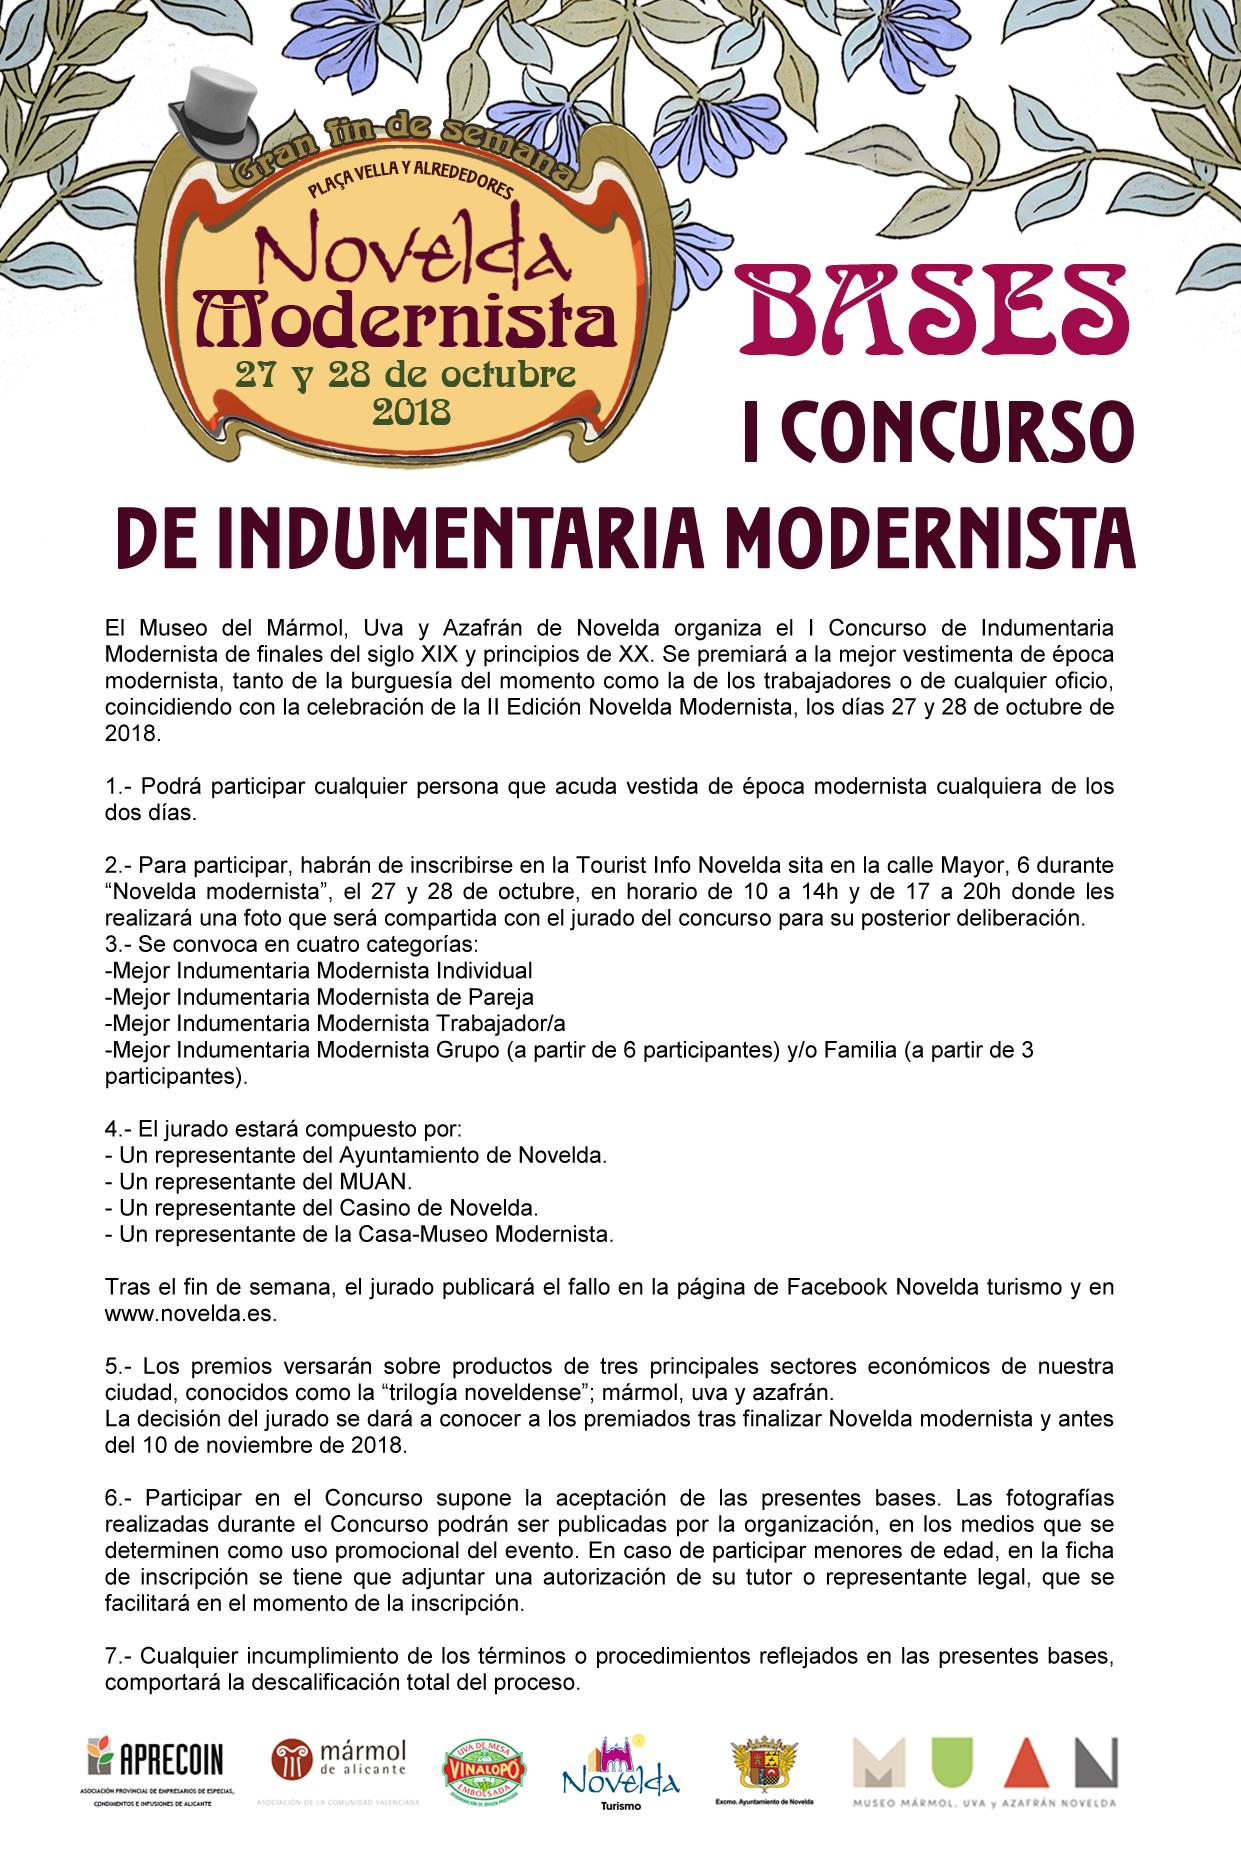 BASES I CONCURSO INDUMENTARIA MODERNISTA 2018 (1)-1 copia